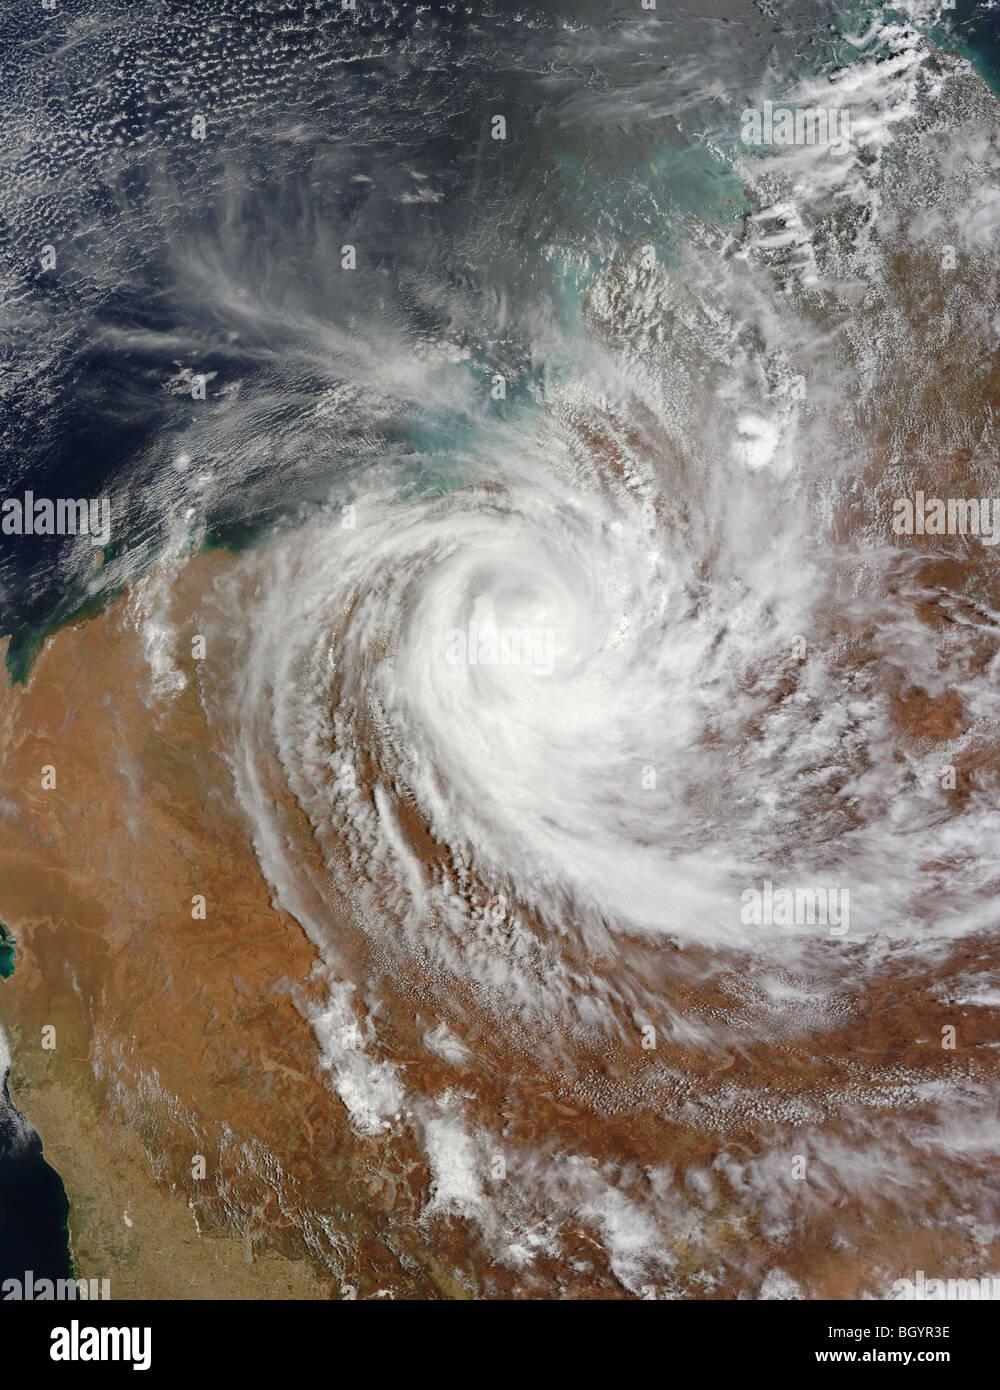 Zyklon Laurence über Australien, Satellitenbild der NASA Stockbild